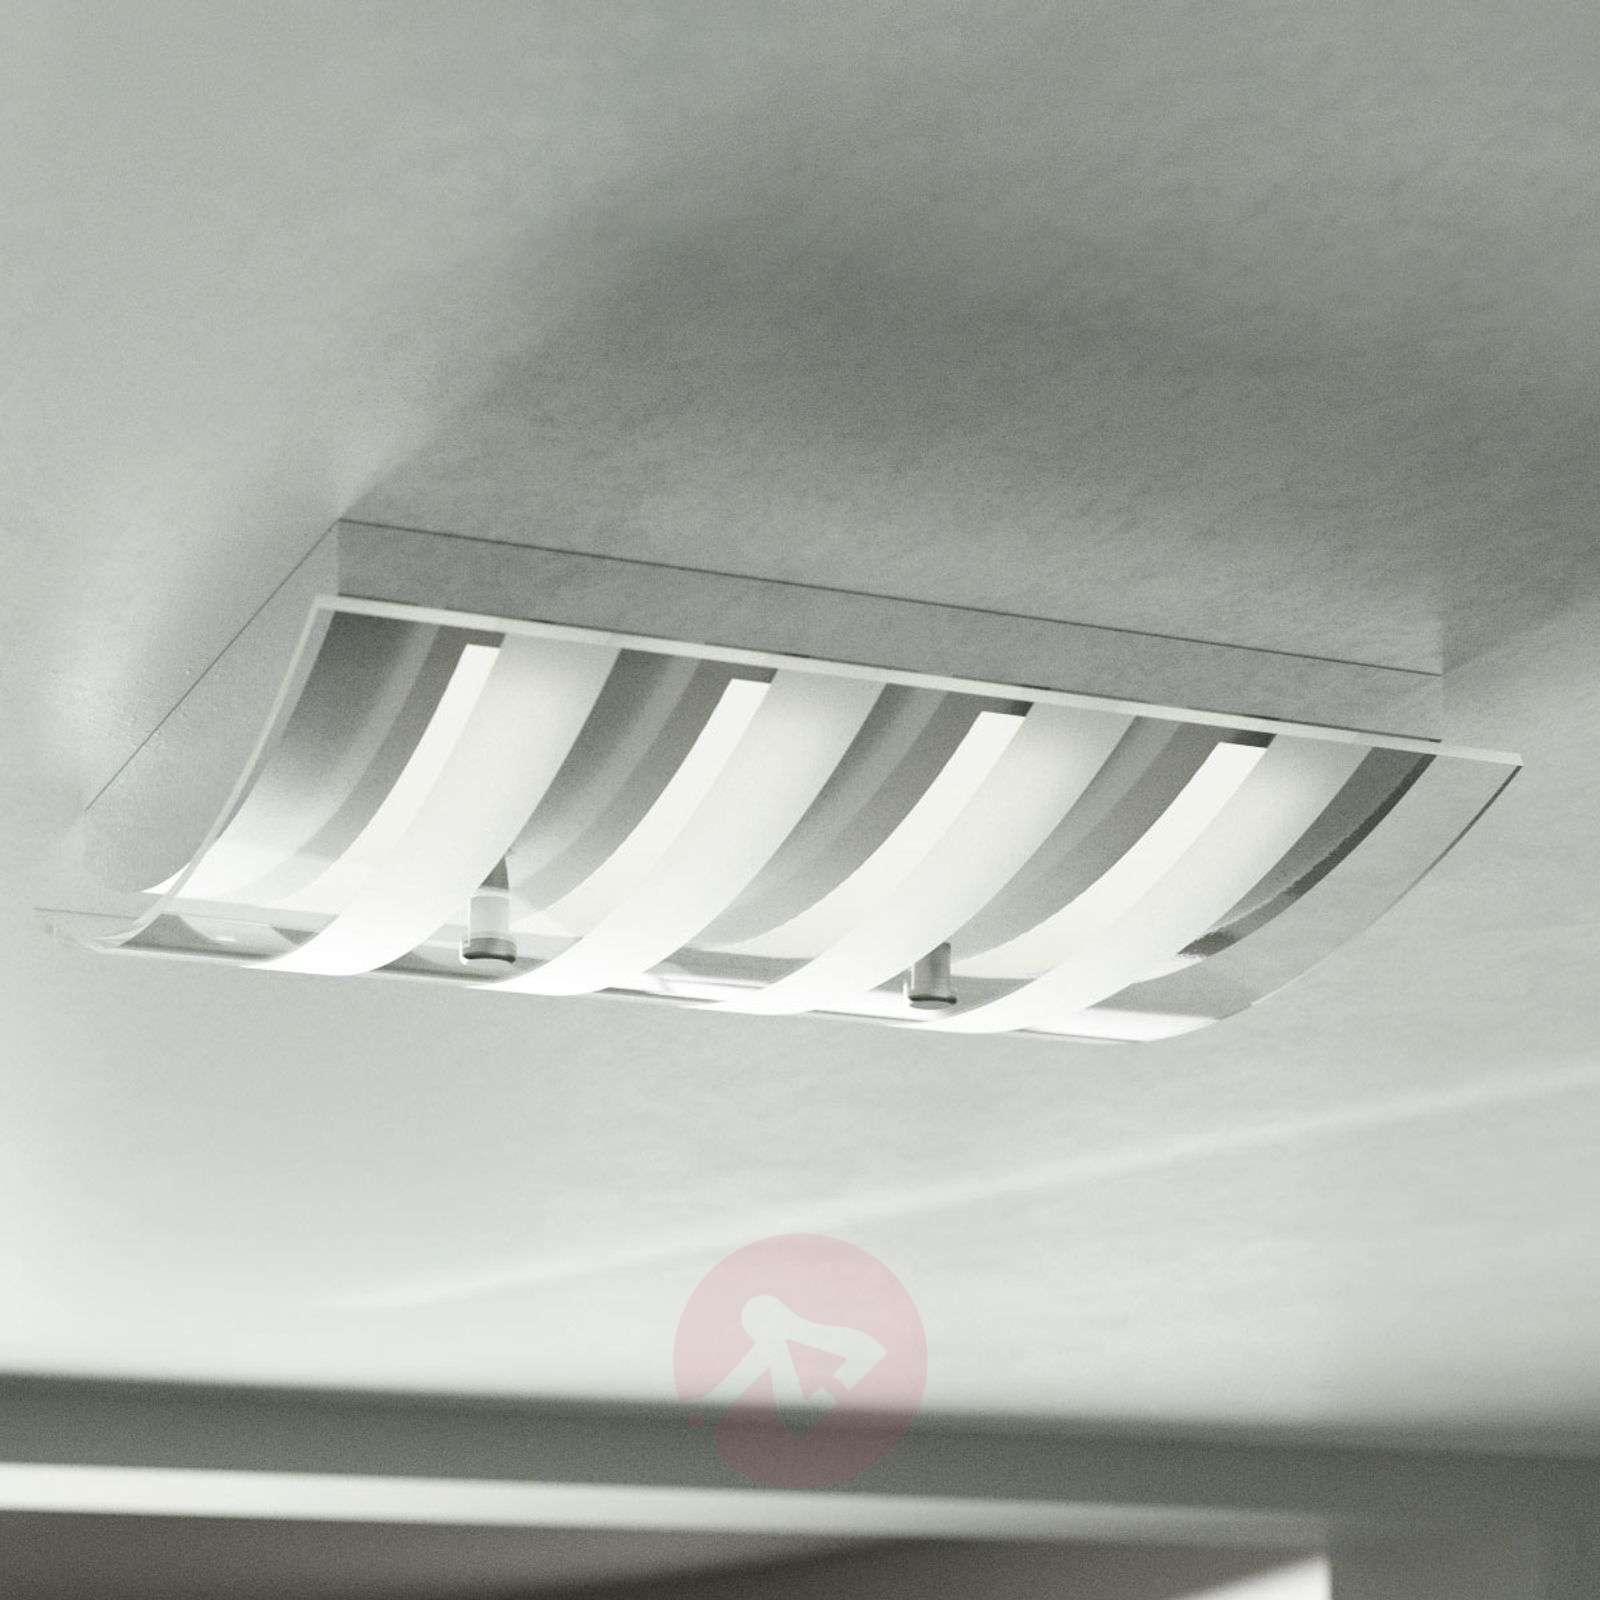 GROSSMANN Vita LED-kattovalaisin, kromi-4022057-01